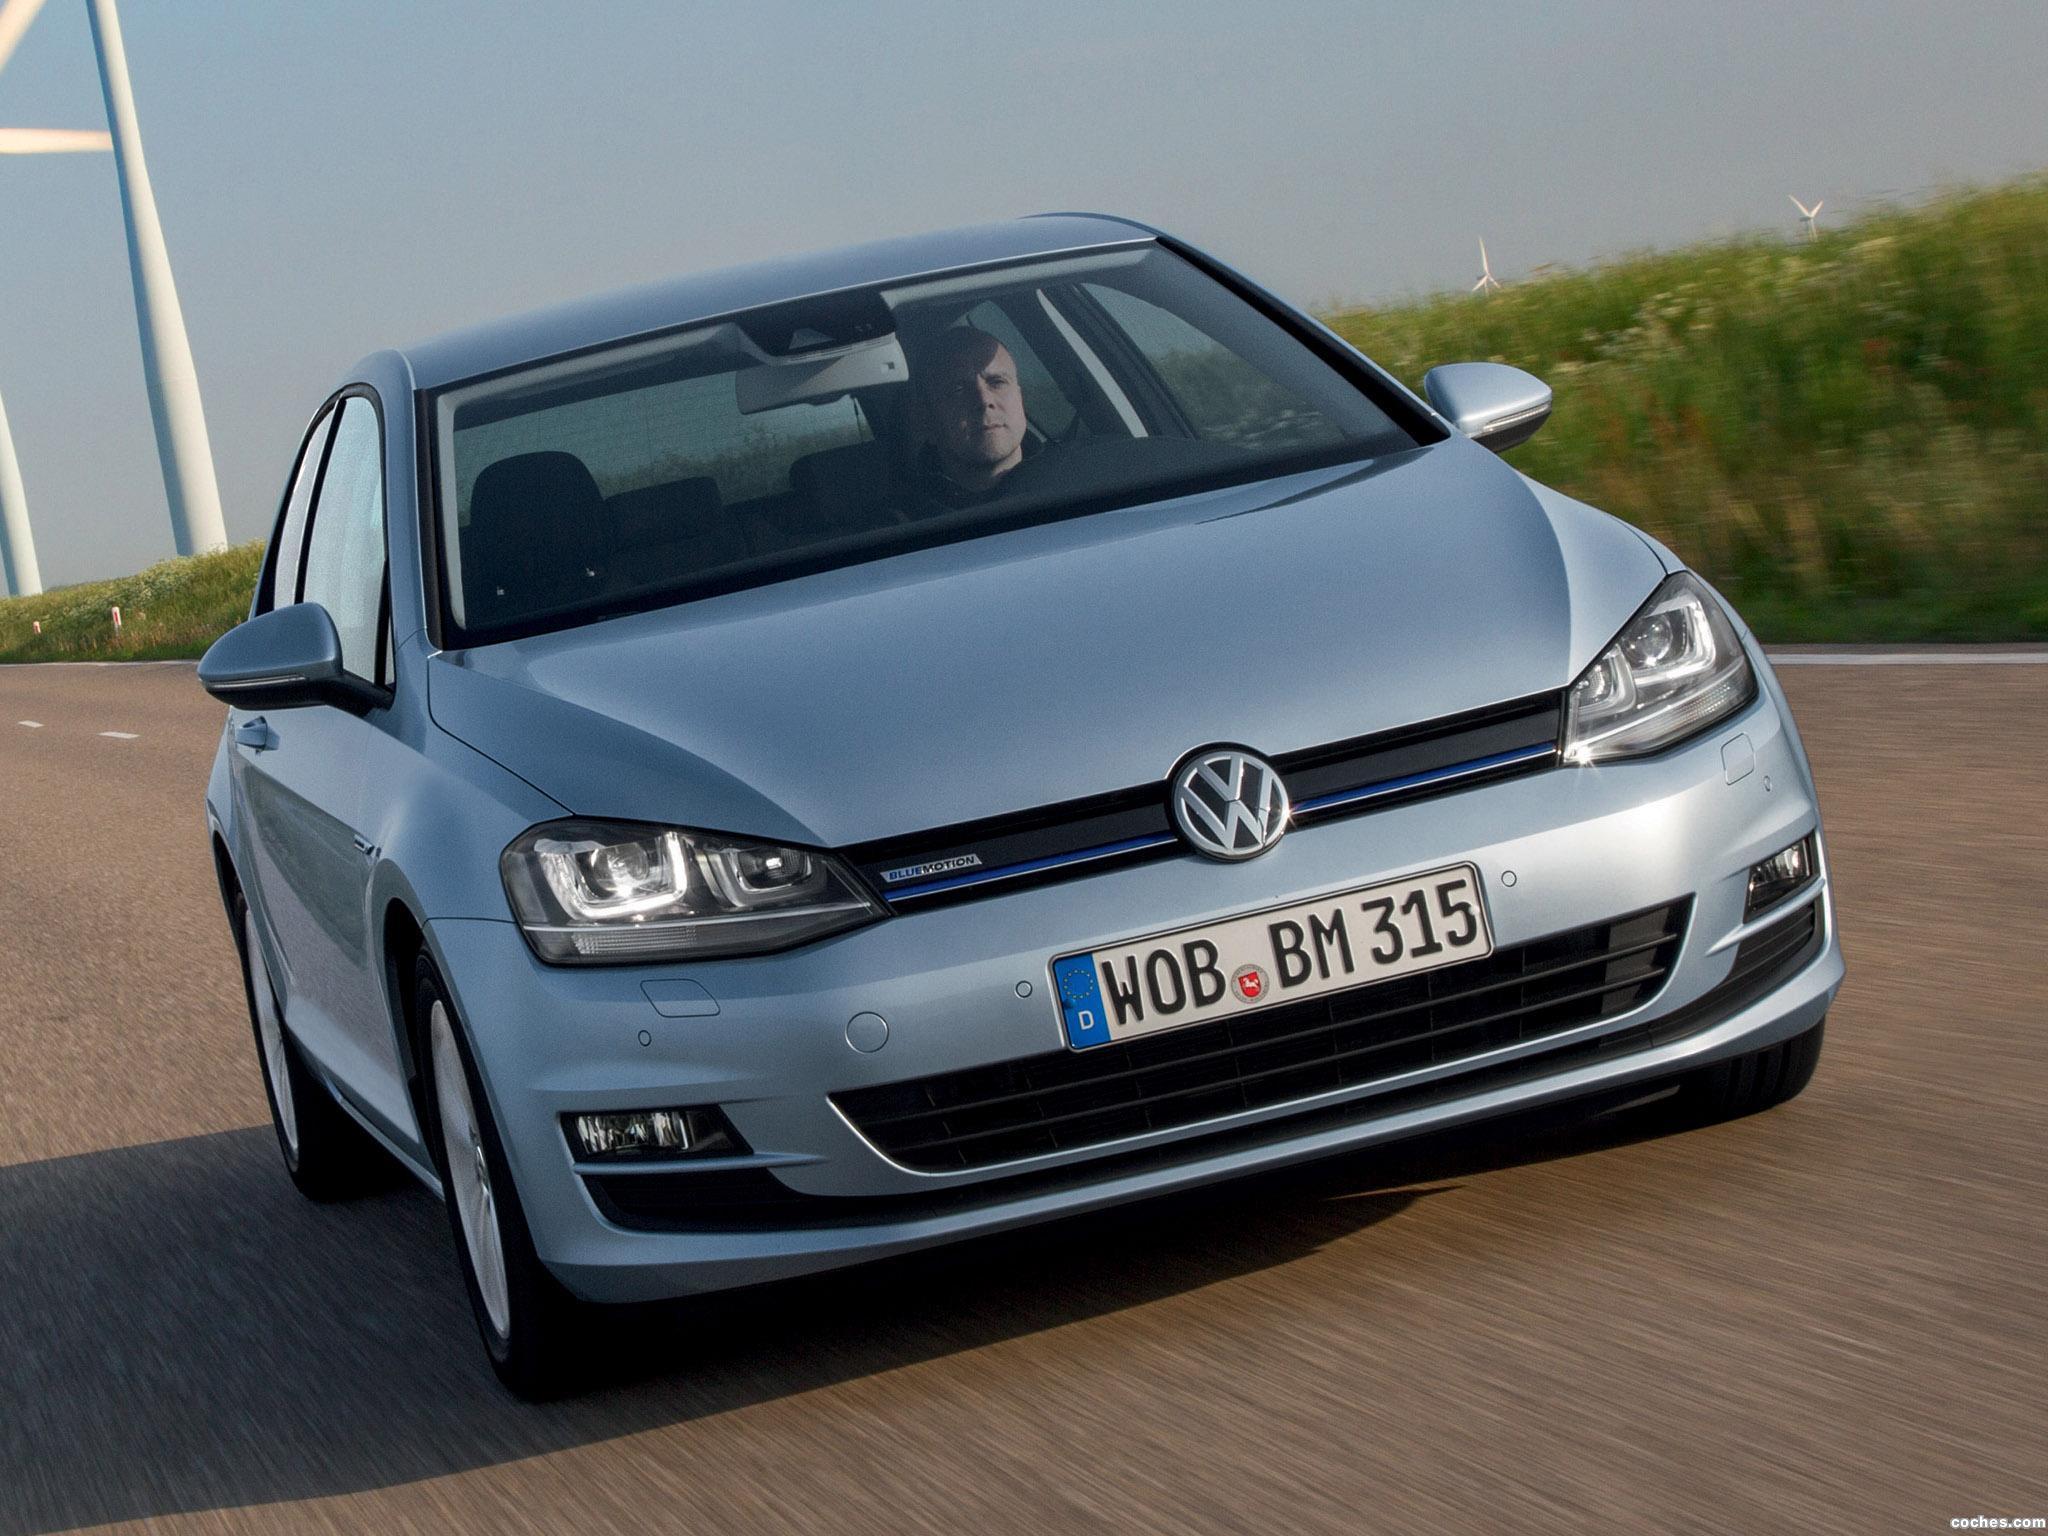 Foto 0 de Volkswagen Golf 7 3 puertas TDI BlueMotion 2013